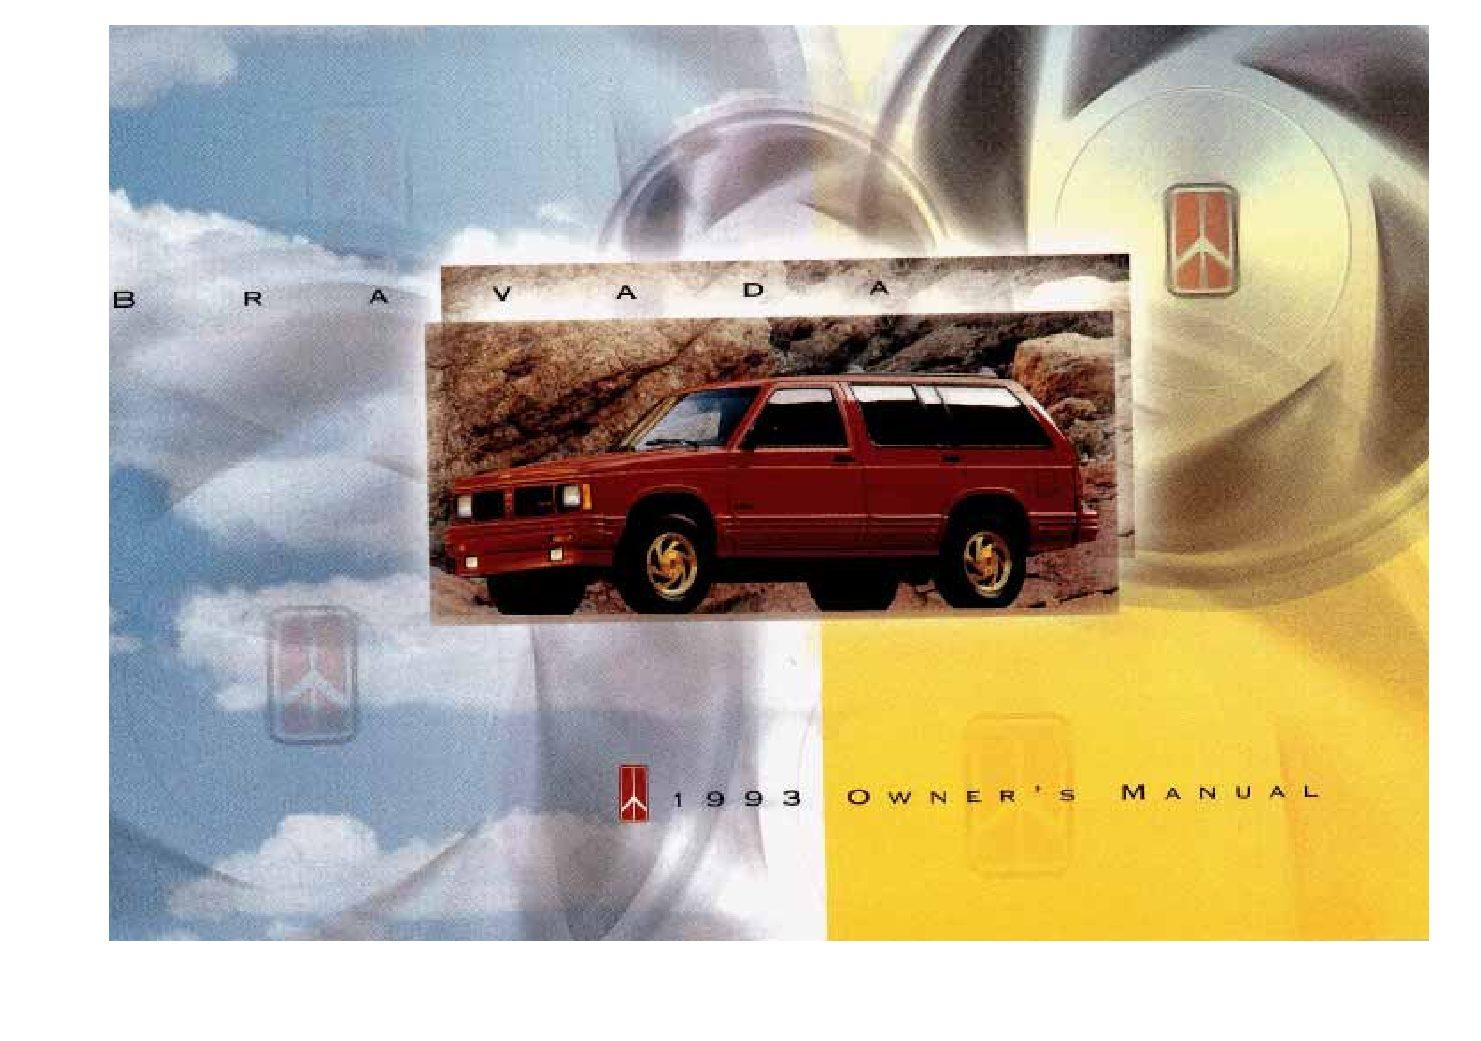 2002 oldsmobile bravada owners manual best setting instruction guide u2022 rh ourk9 co 2001 Oldsmobile Bravada 2001 Oldsmobile Bravada